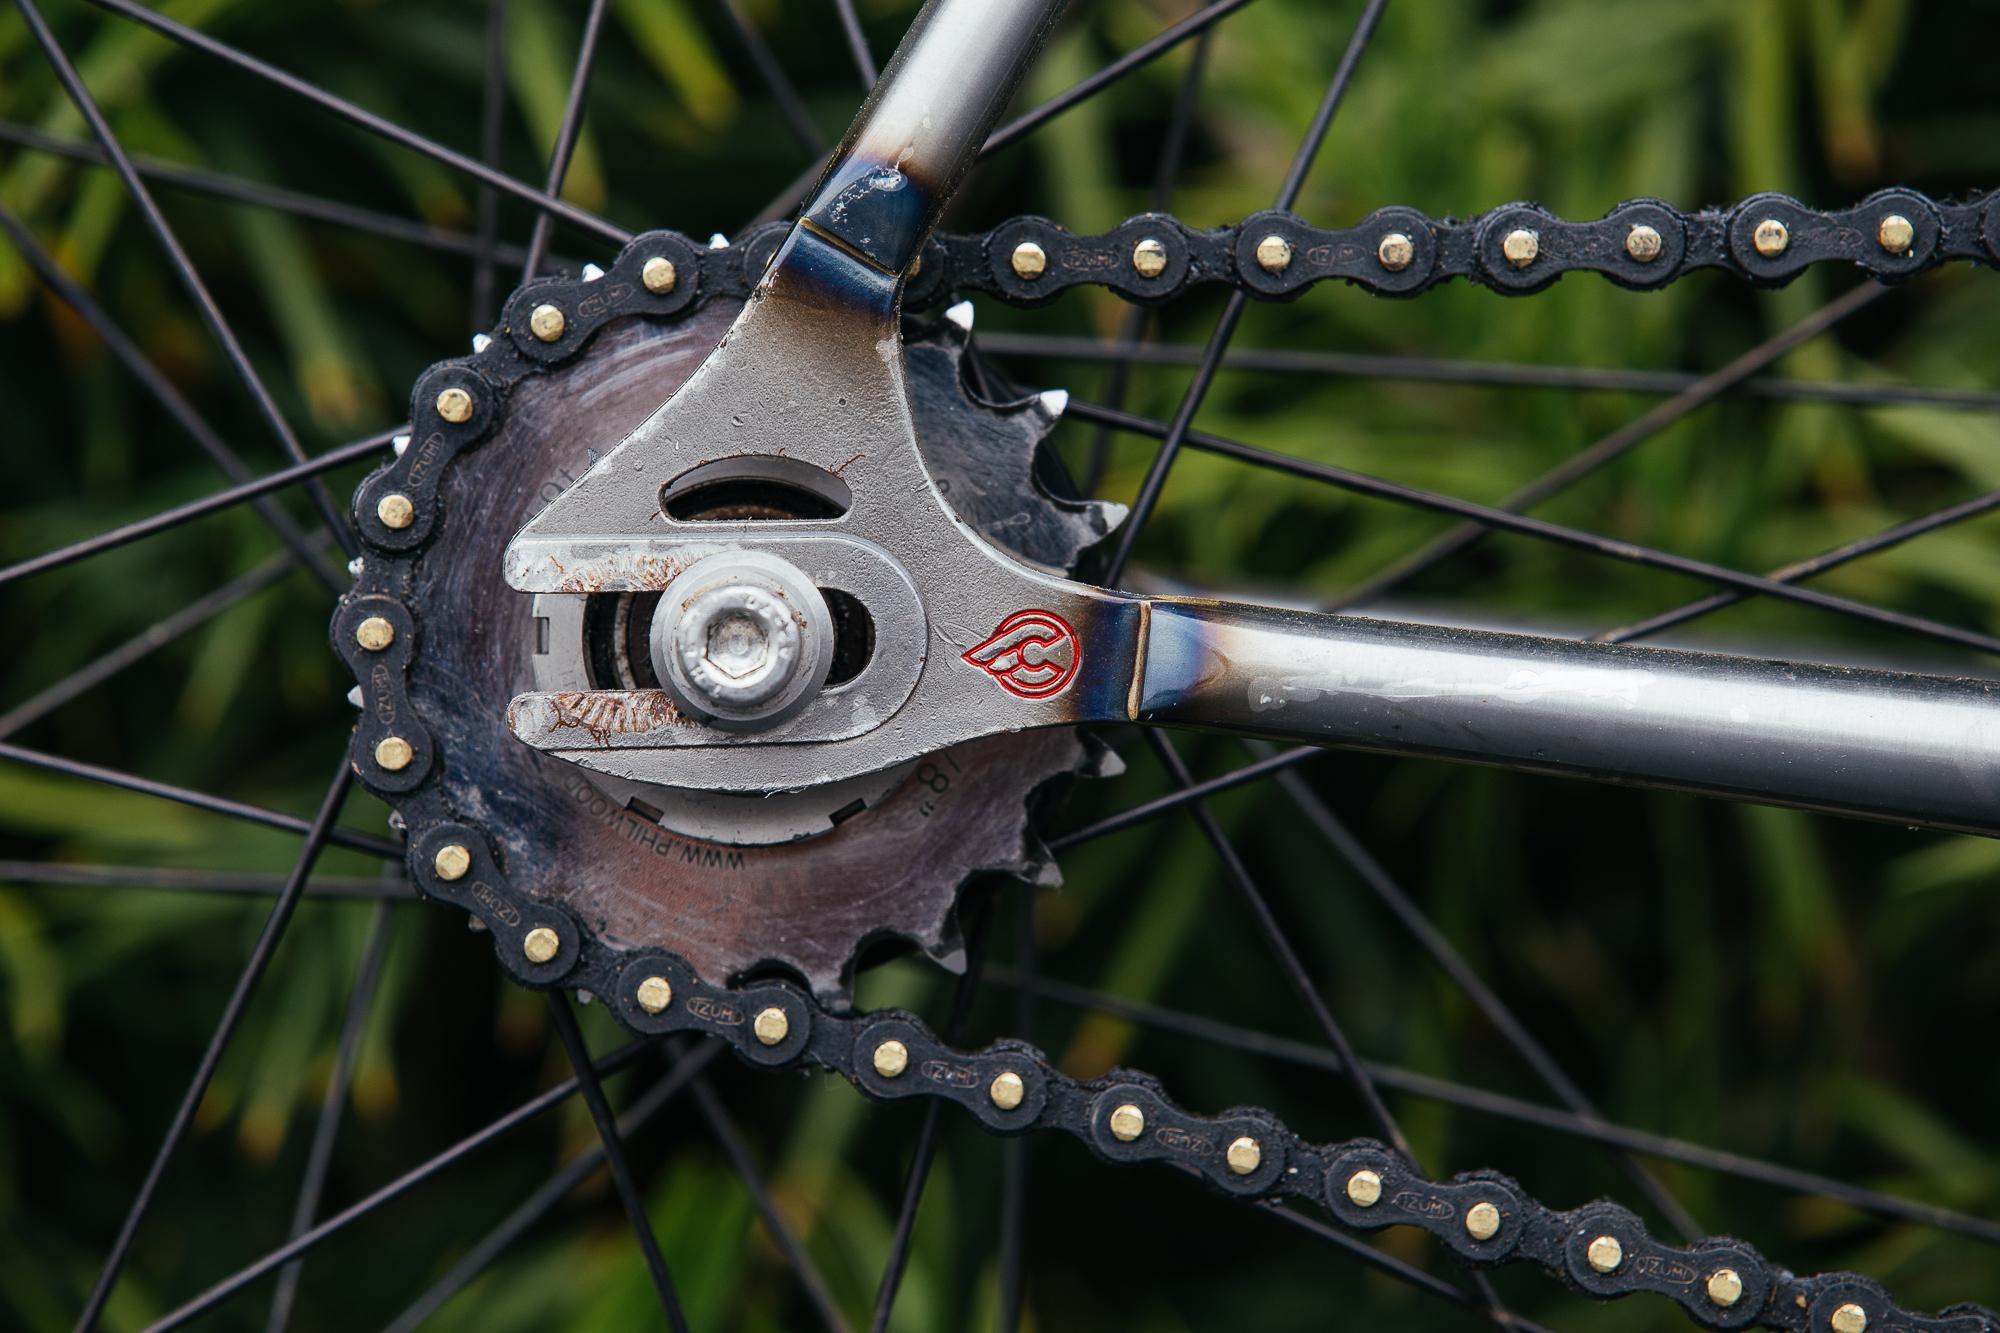 Brian's Cinelli Work Bike